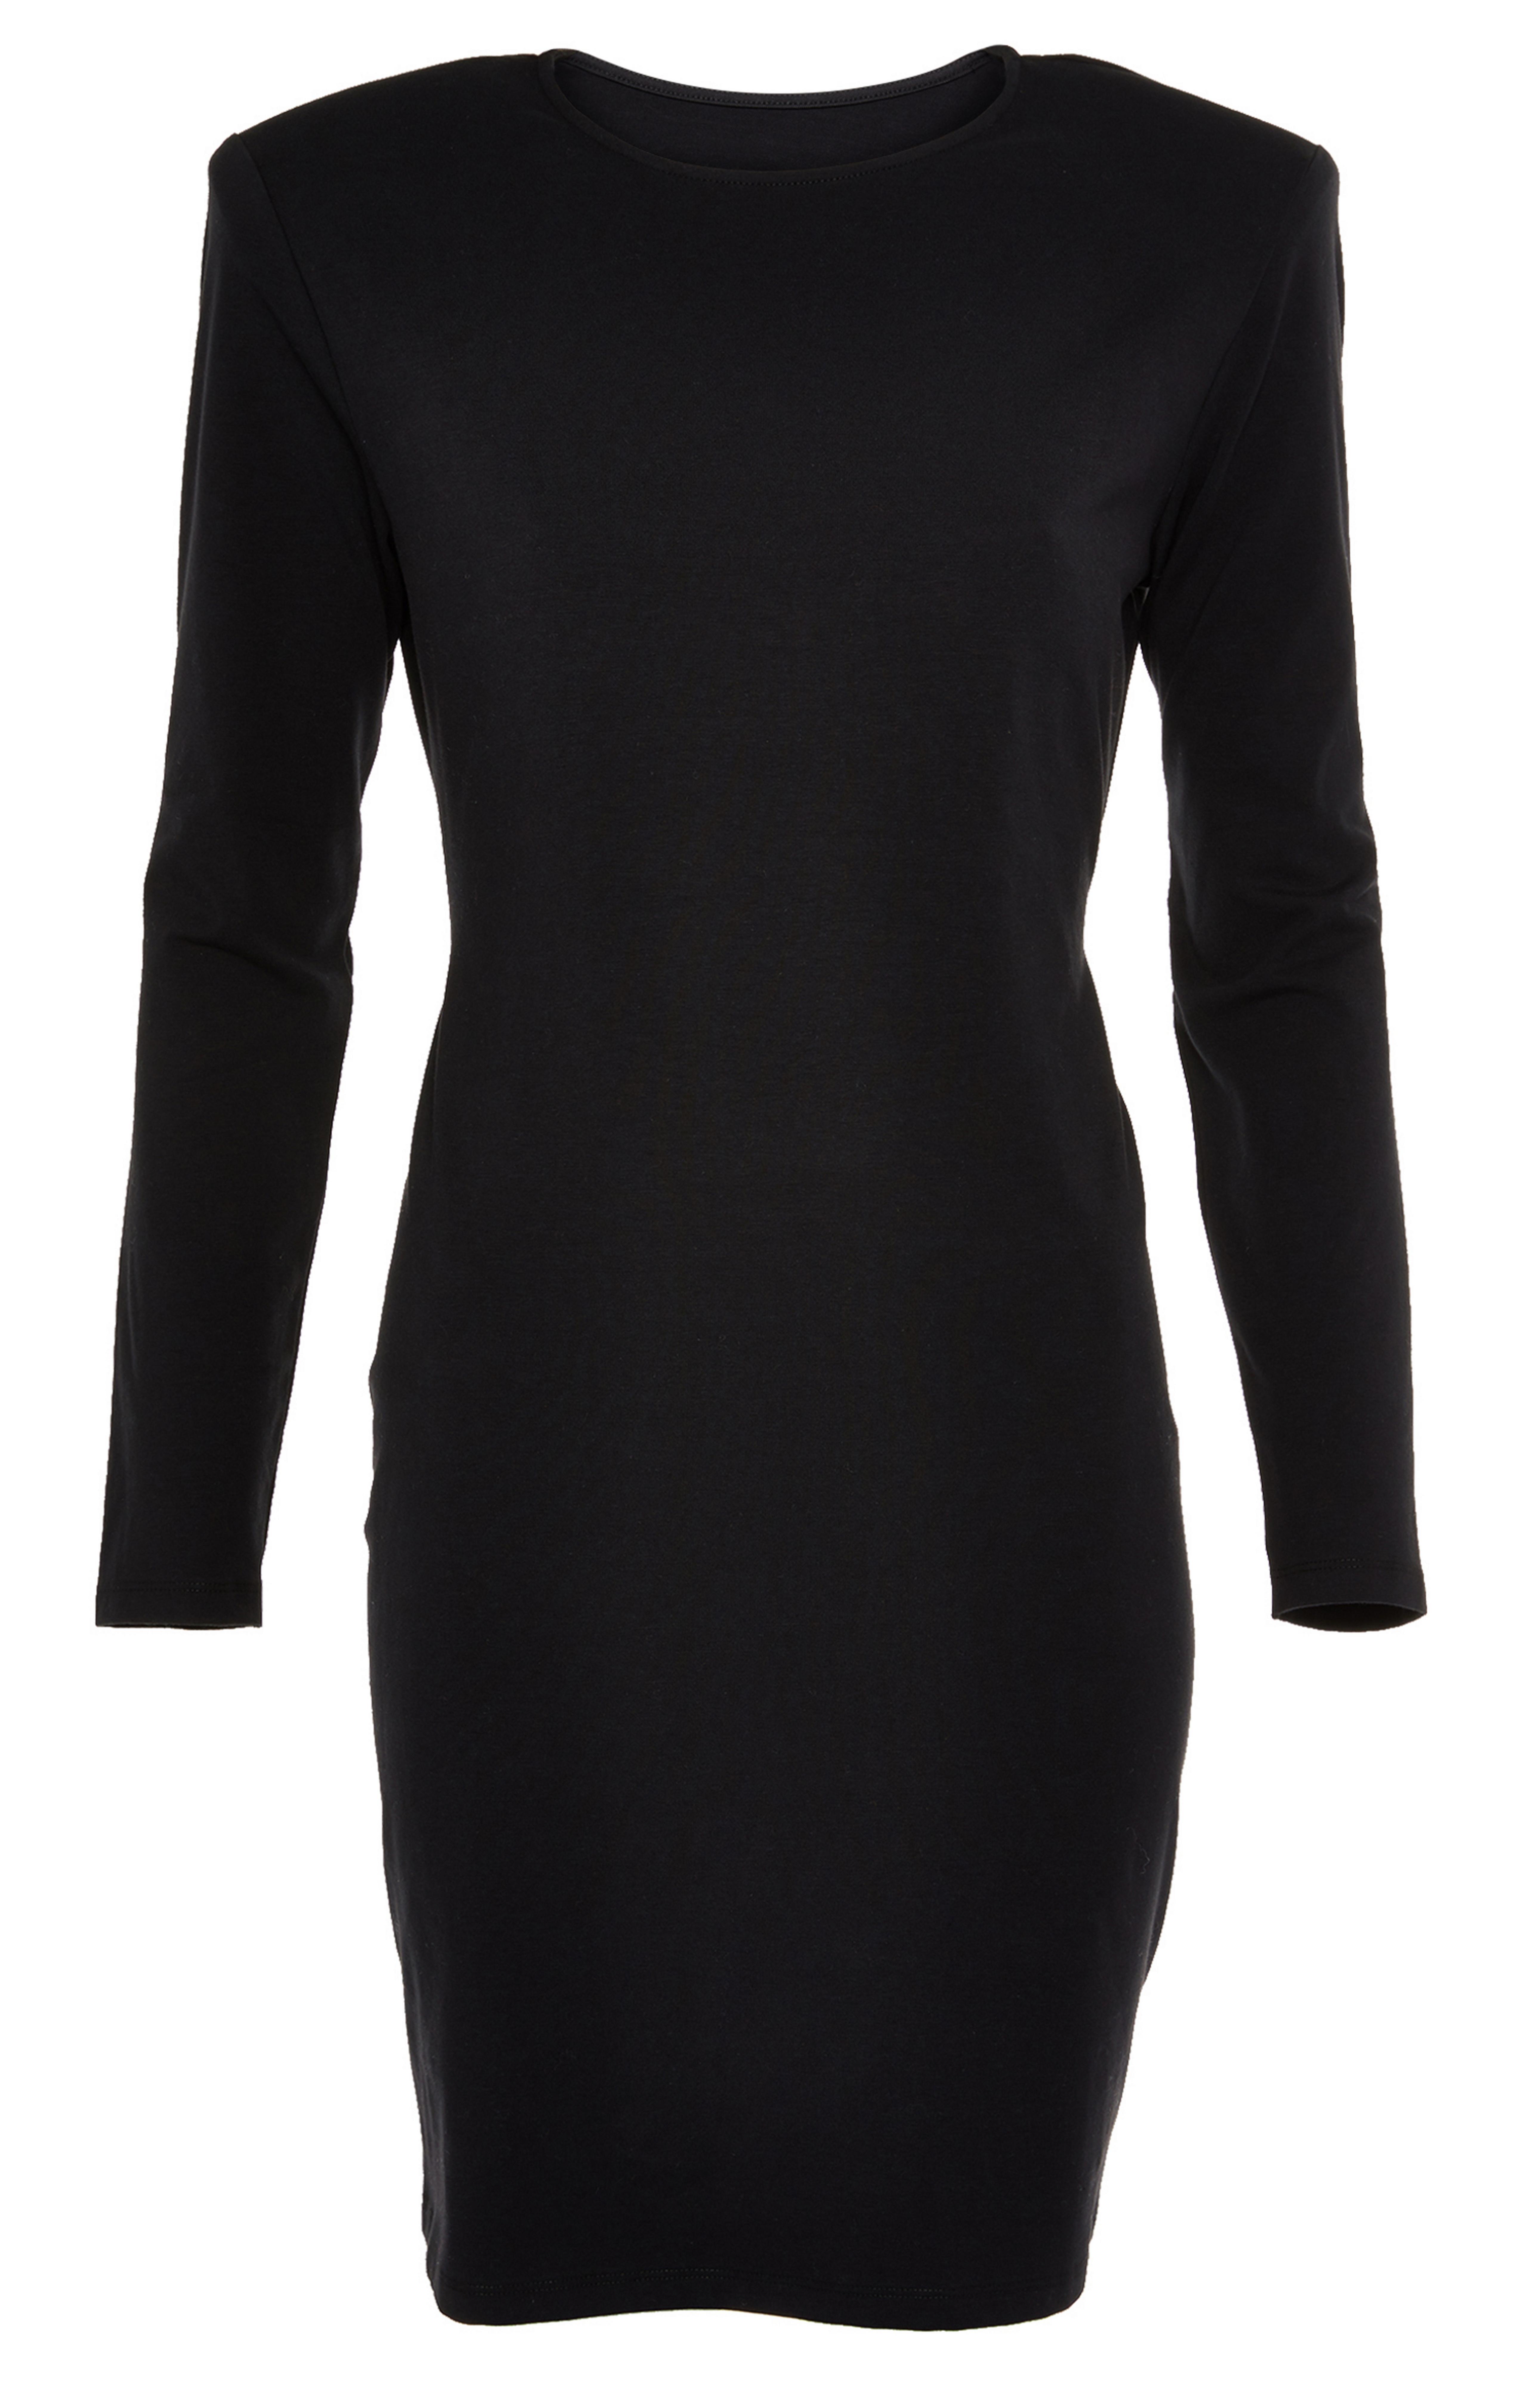 Bardot Mini Dress One Shoulder Party Women/'s Glitter Club Glitter New Primark